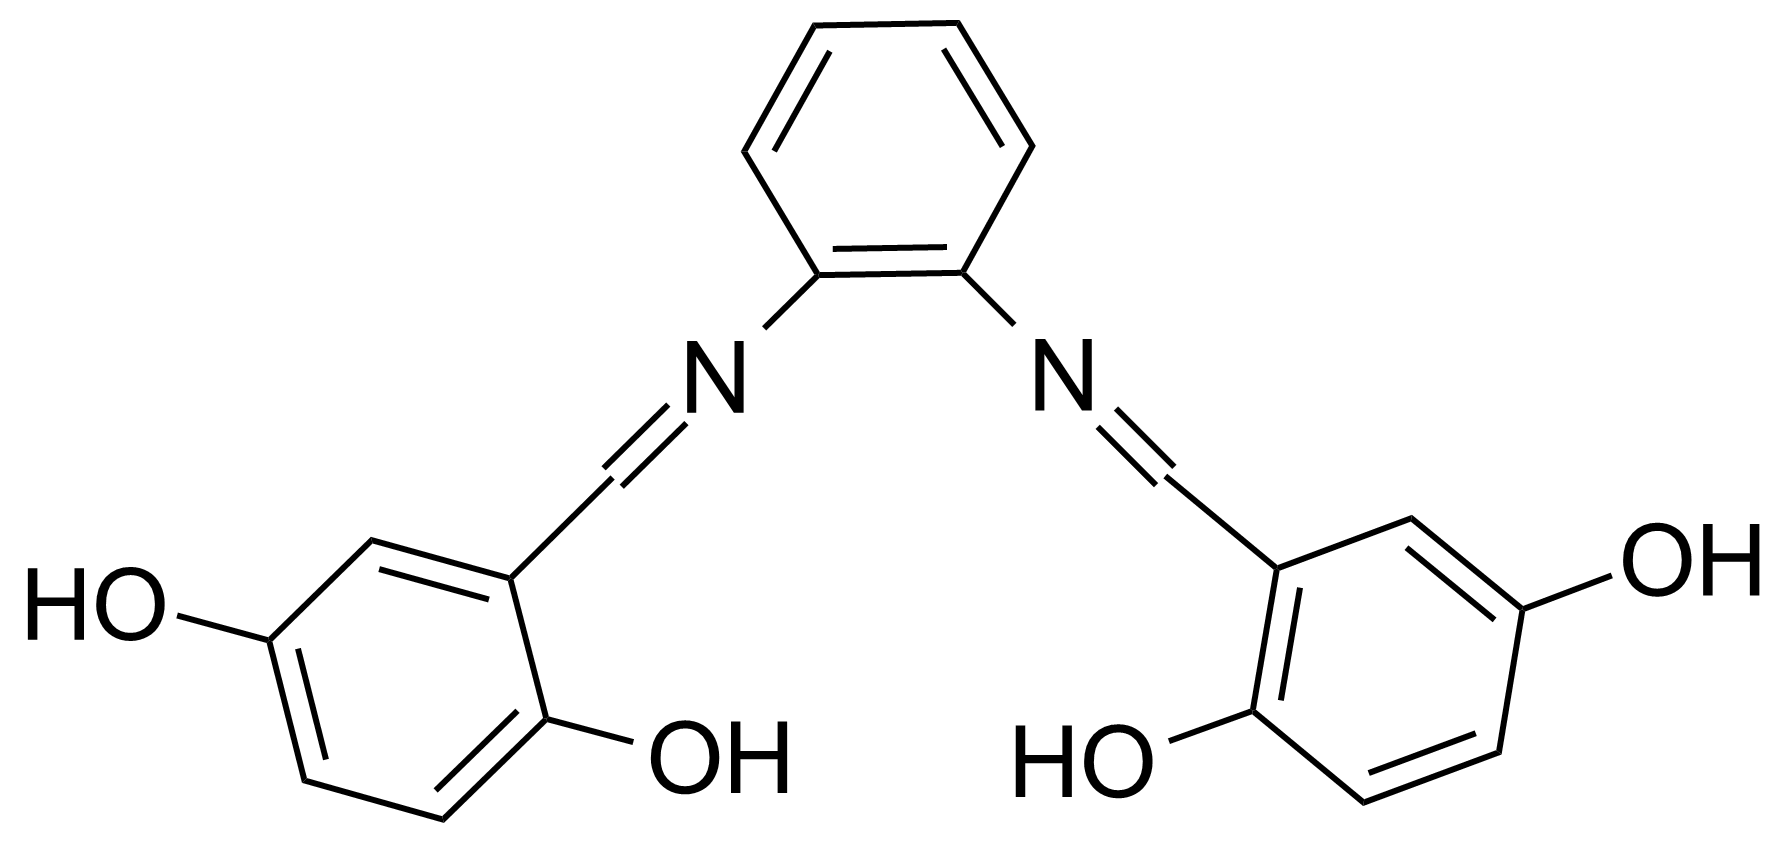 Structure of N,N-Bis(2,5-dihydroxybenzylidene)-1,2-diaminobenzene